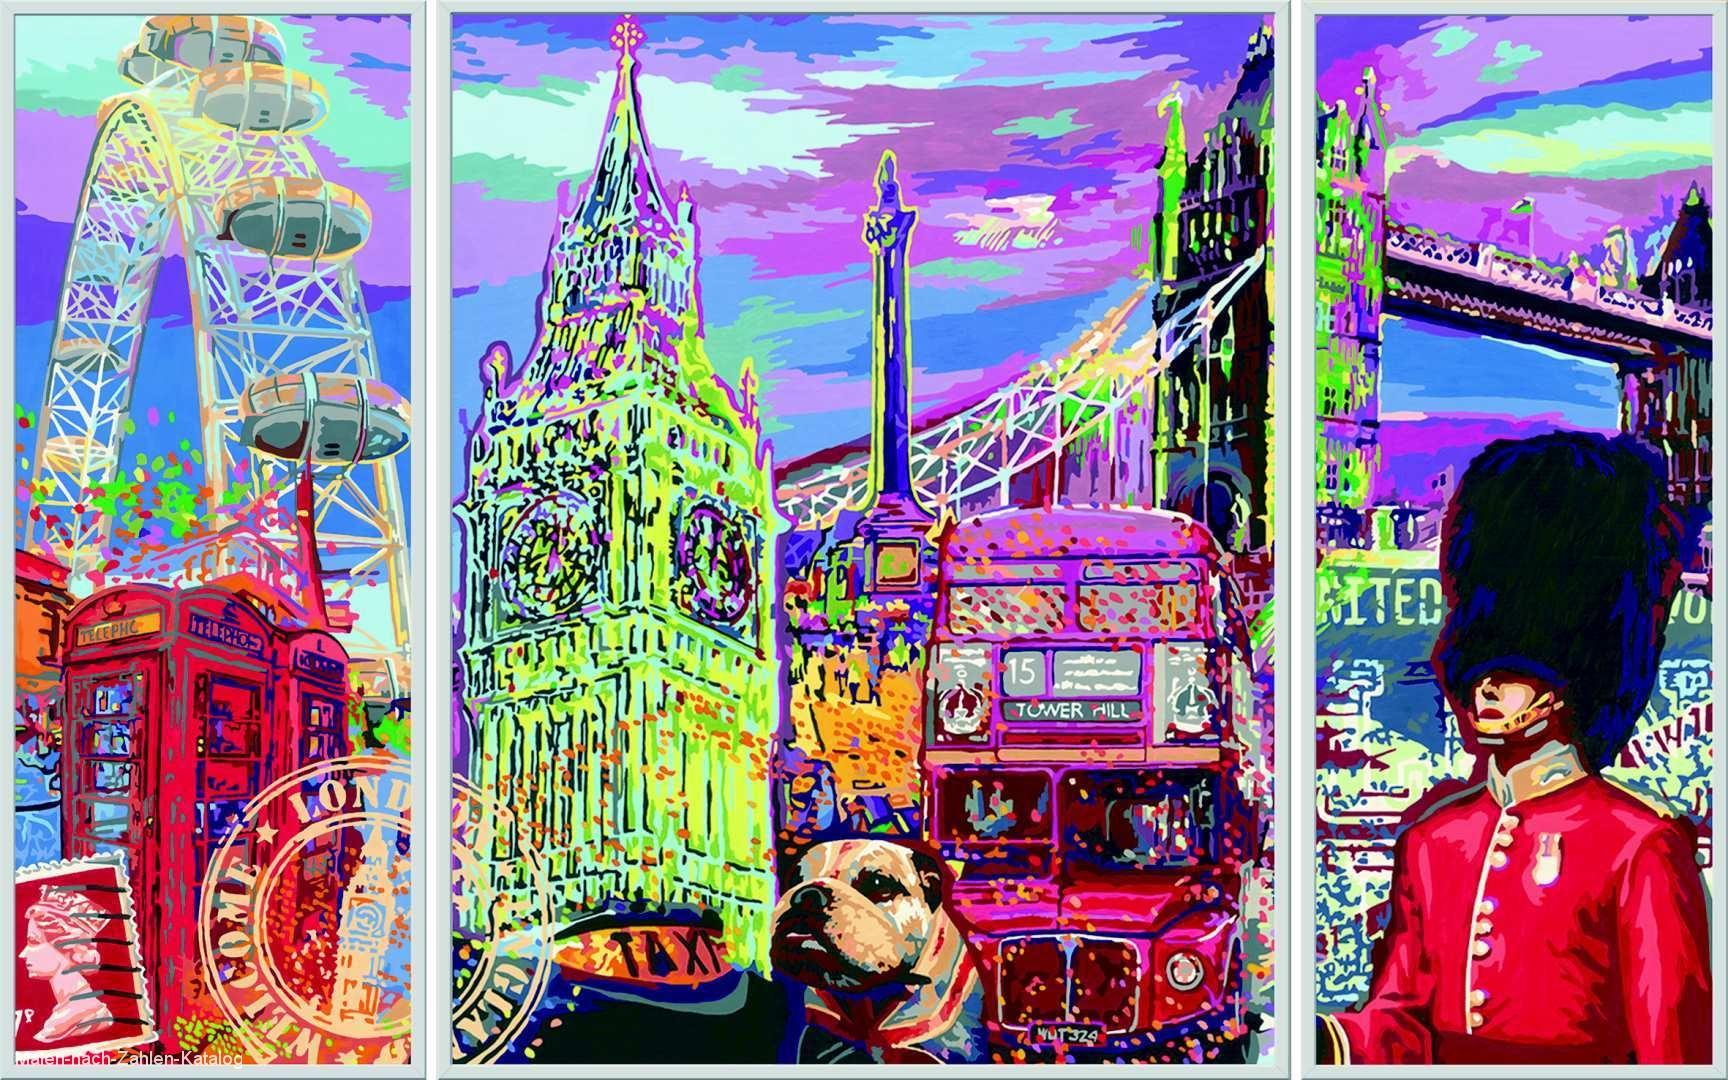 Ravensburger Malen nach Zahlen Serie Premium Triptychon - London City